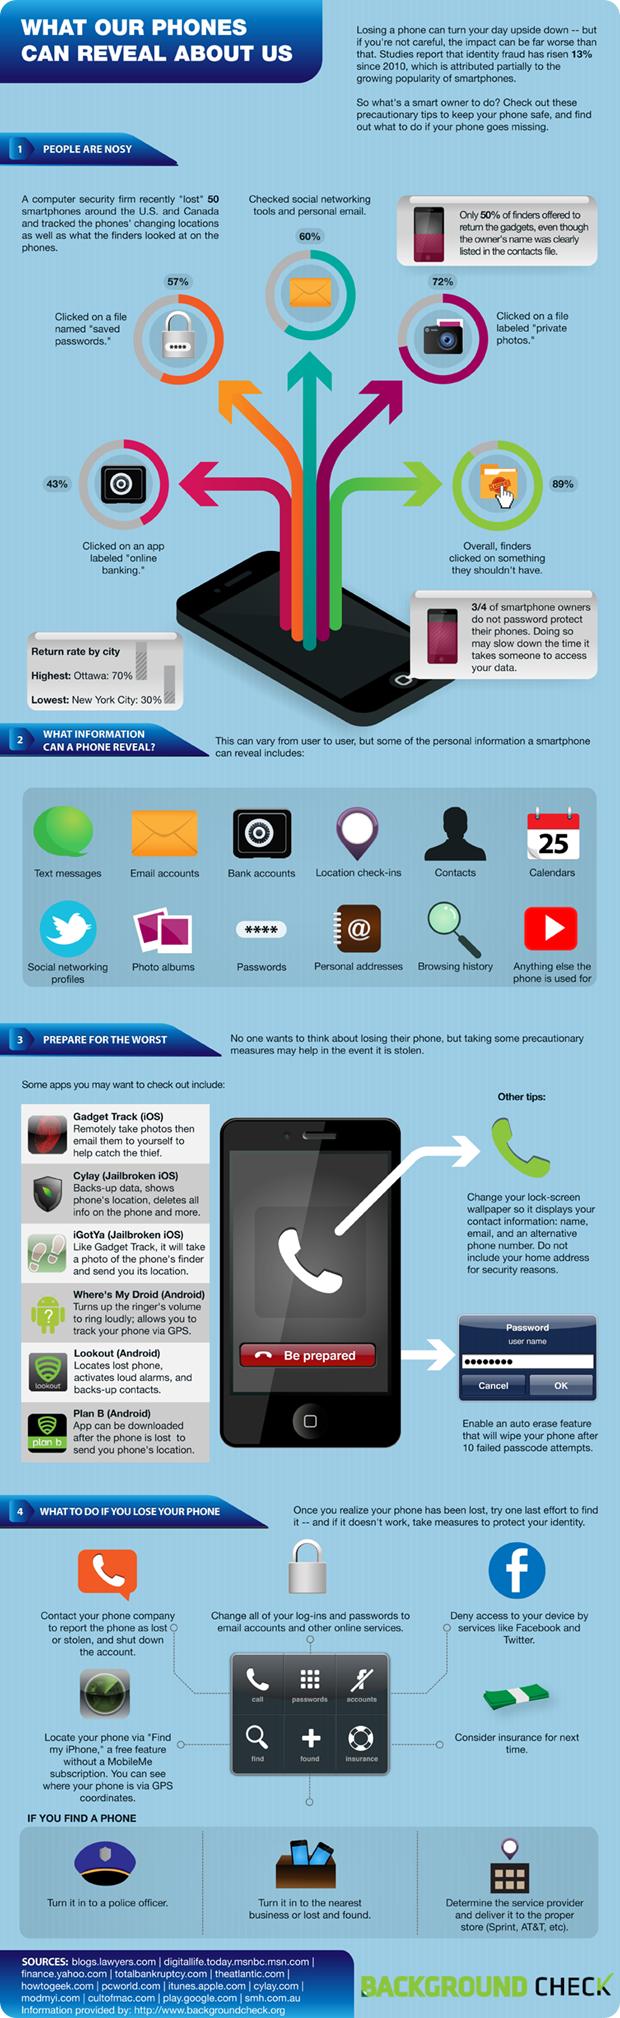 SmartPhones-Identity-Theft